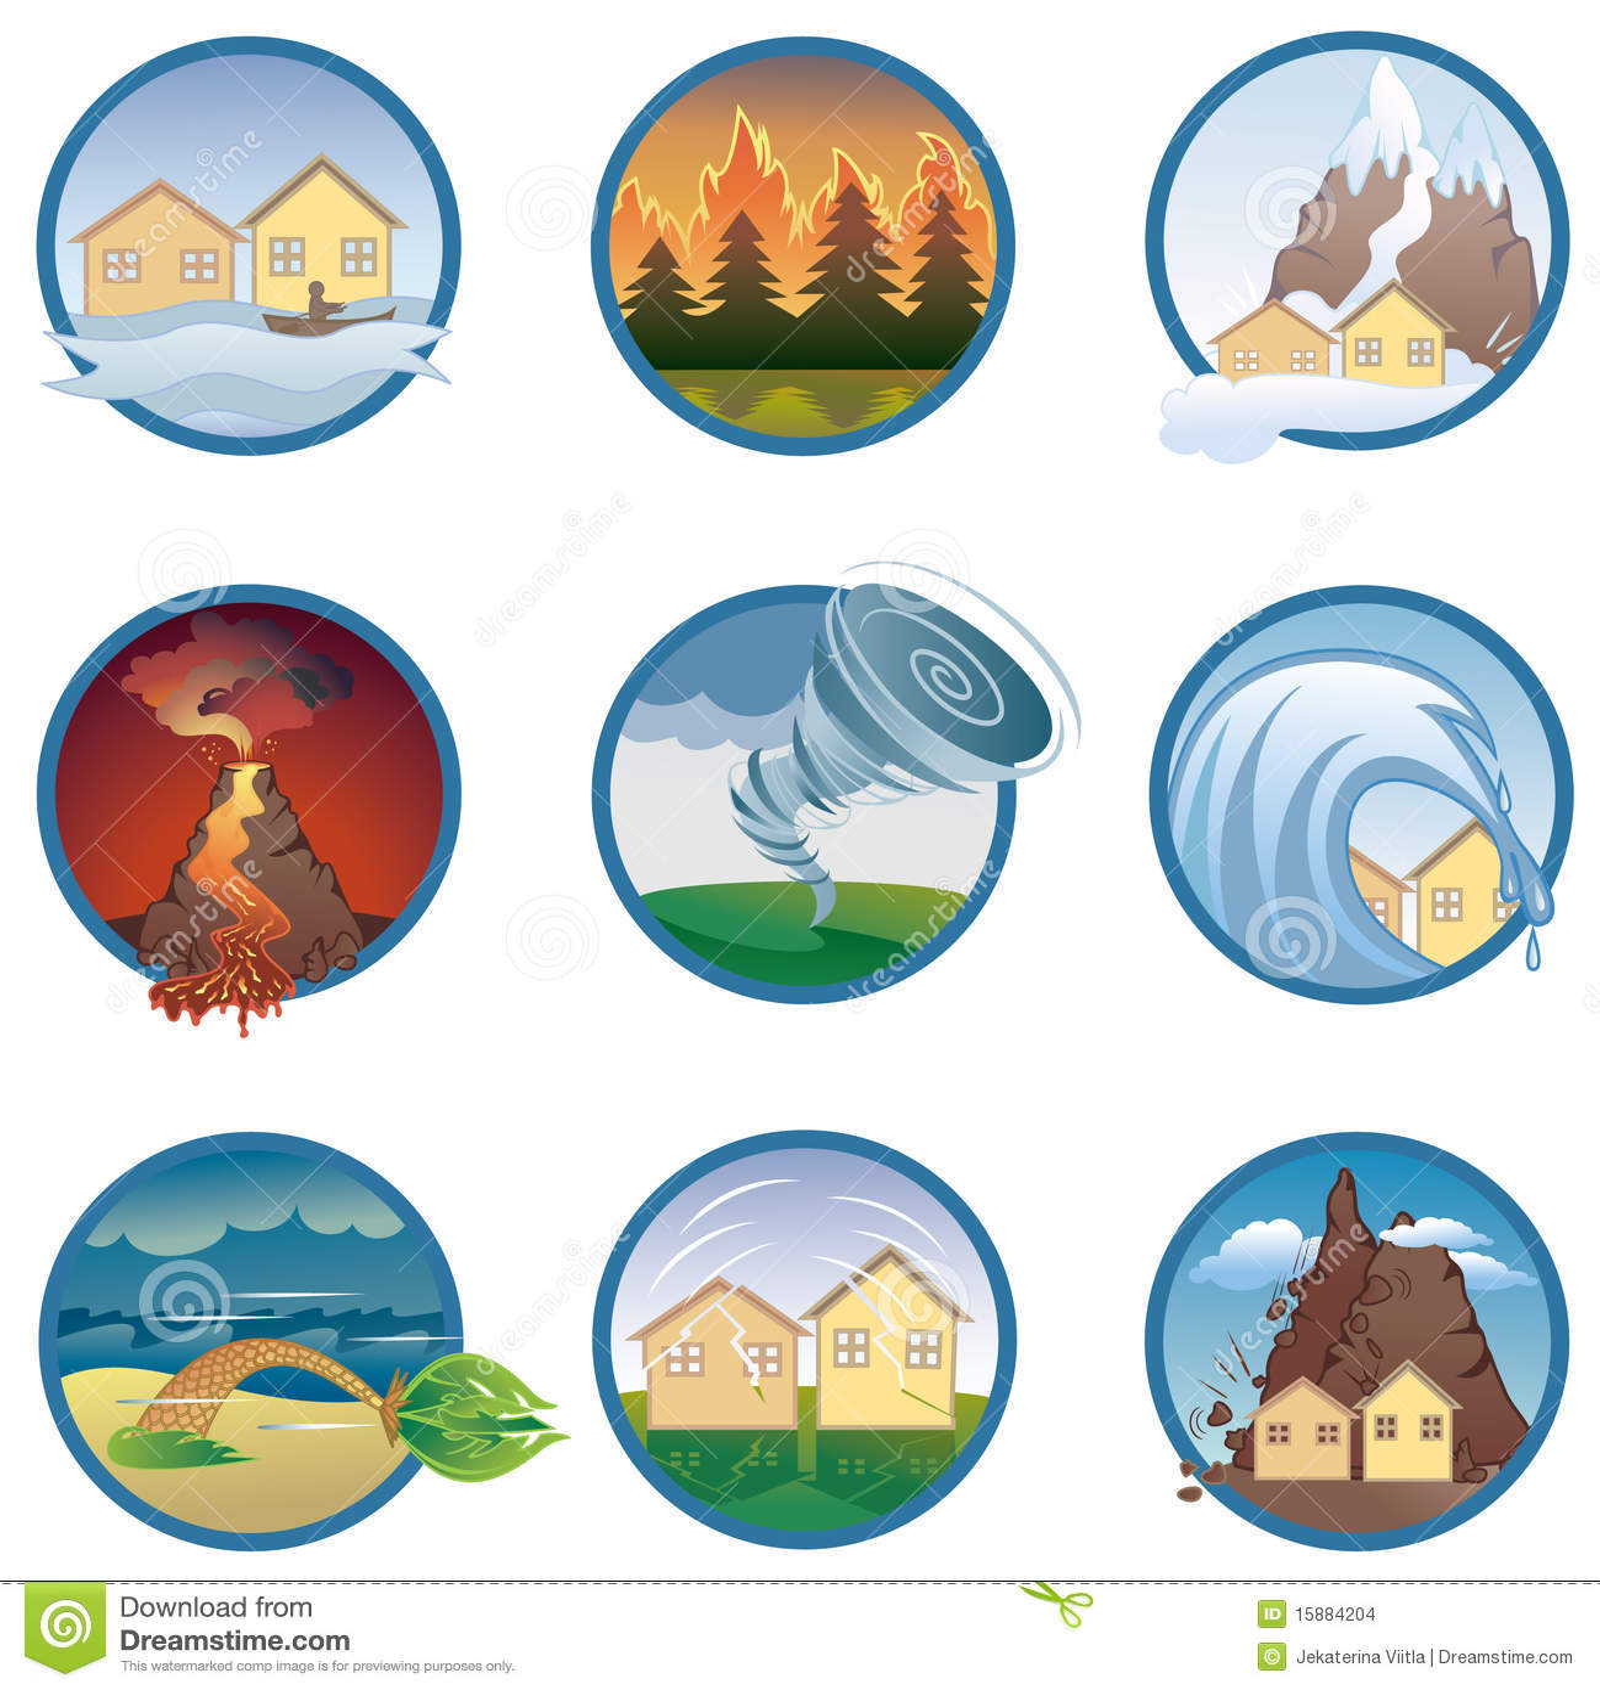 iconos de los desastres naturales ilustraci u00f3n del vector natural resources images clipart natural resources clipart